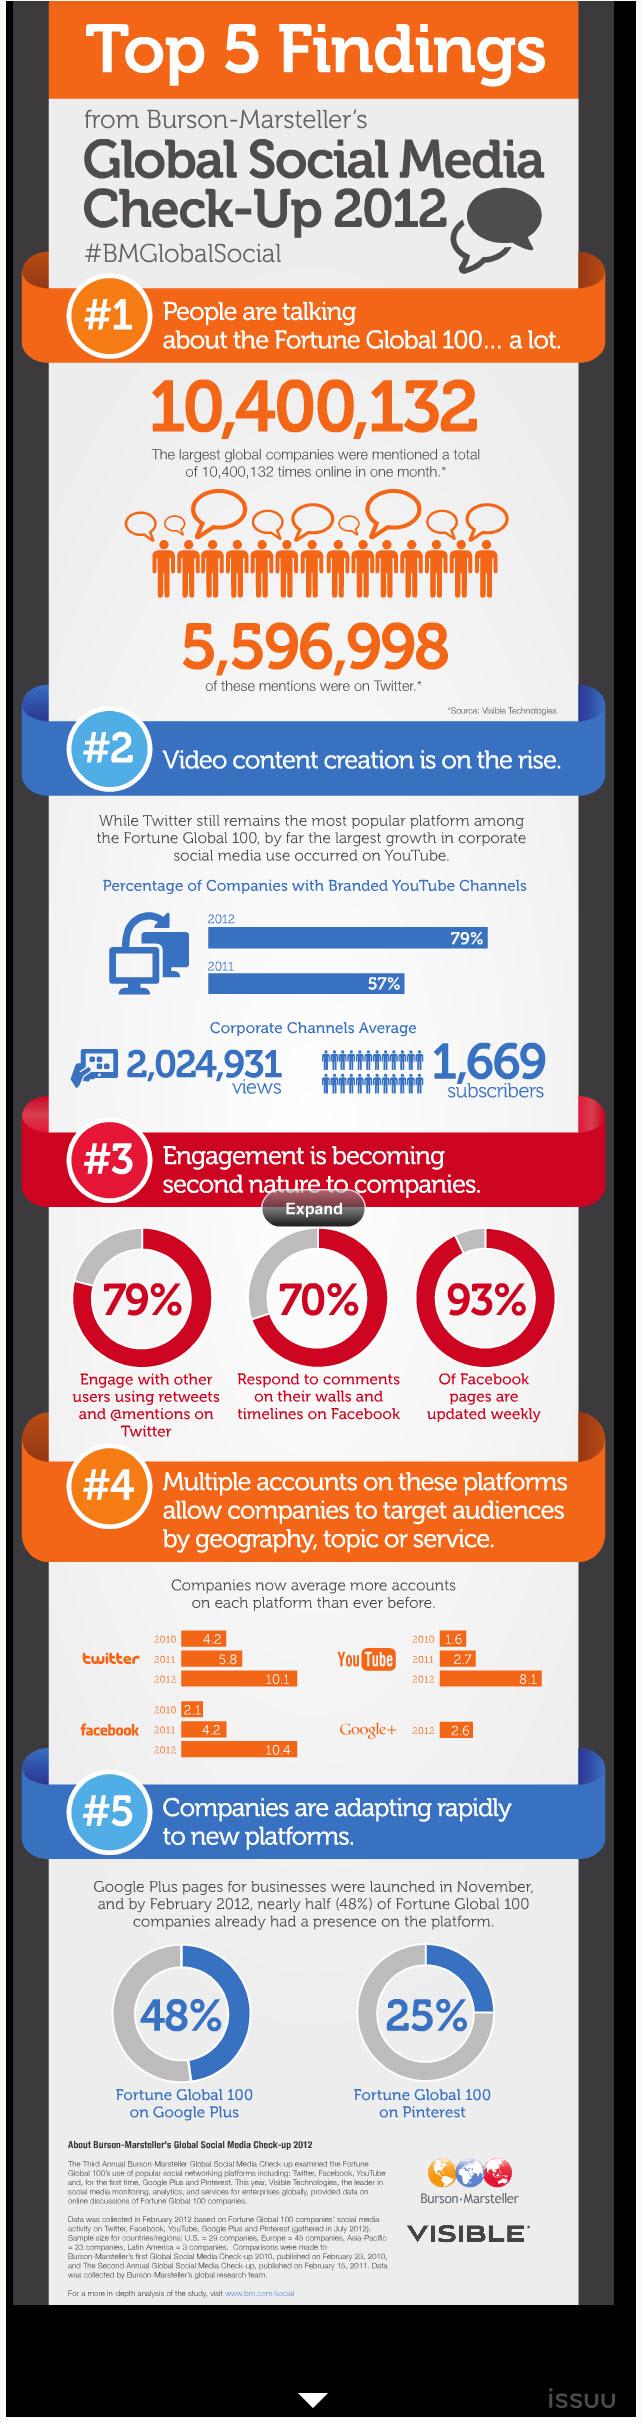 recherche médias sociaux 2012